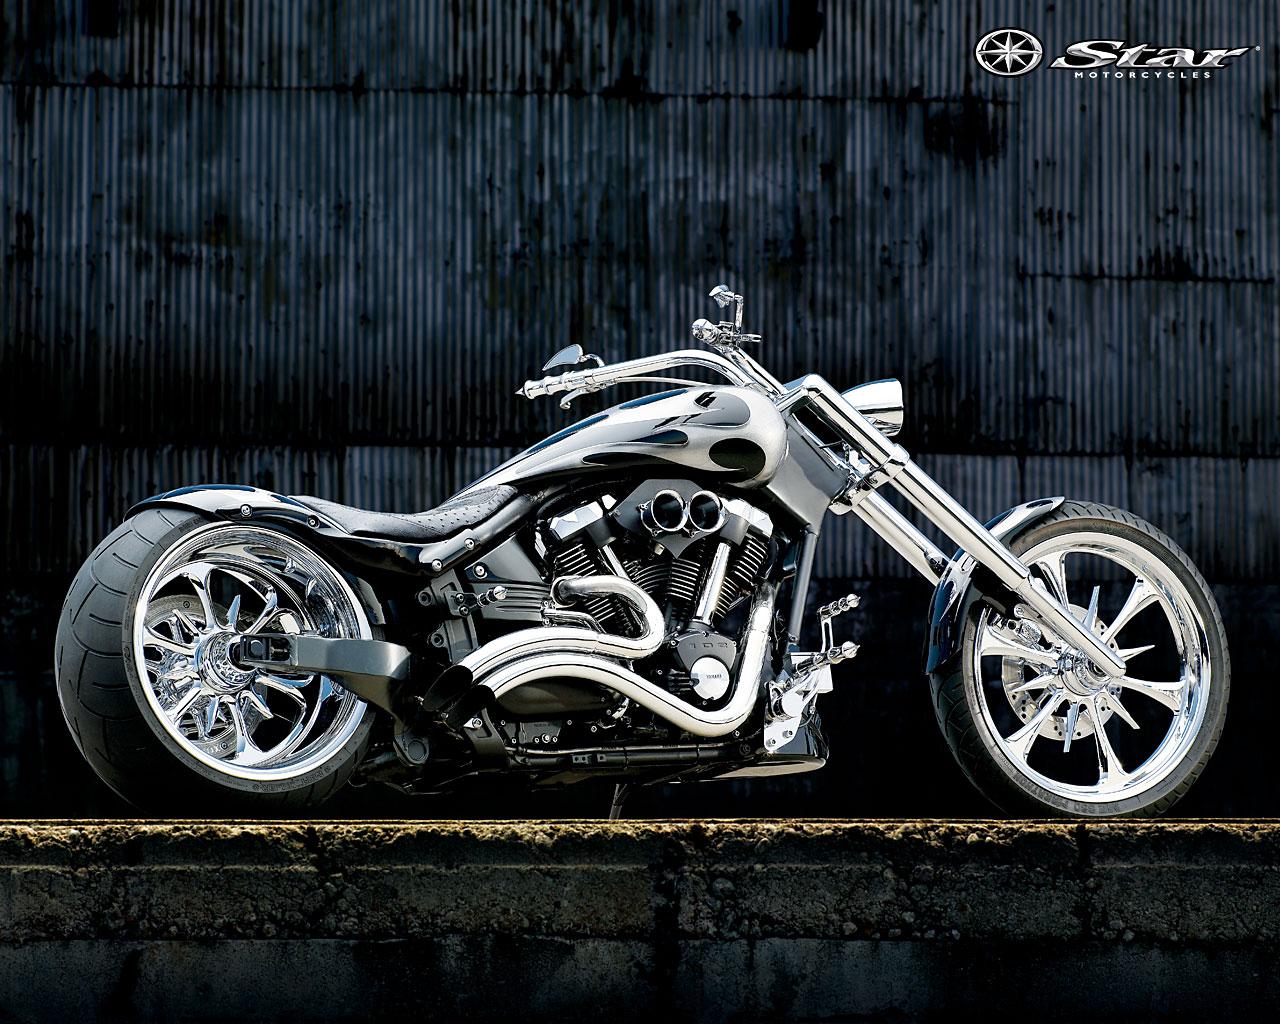 http://2.bp.blogspot.com/_GV0k3zq1xyg/TUprPmiEEuI/AAAAAAAAAU8/PAB-g1QiIsk/s1600/Yamaha-Chopper-Chrome.jpg